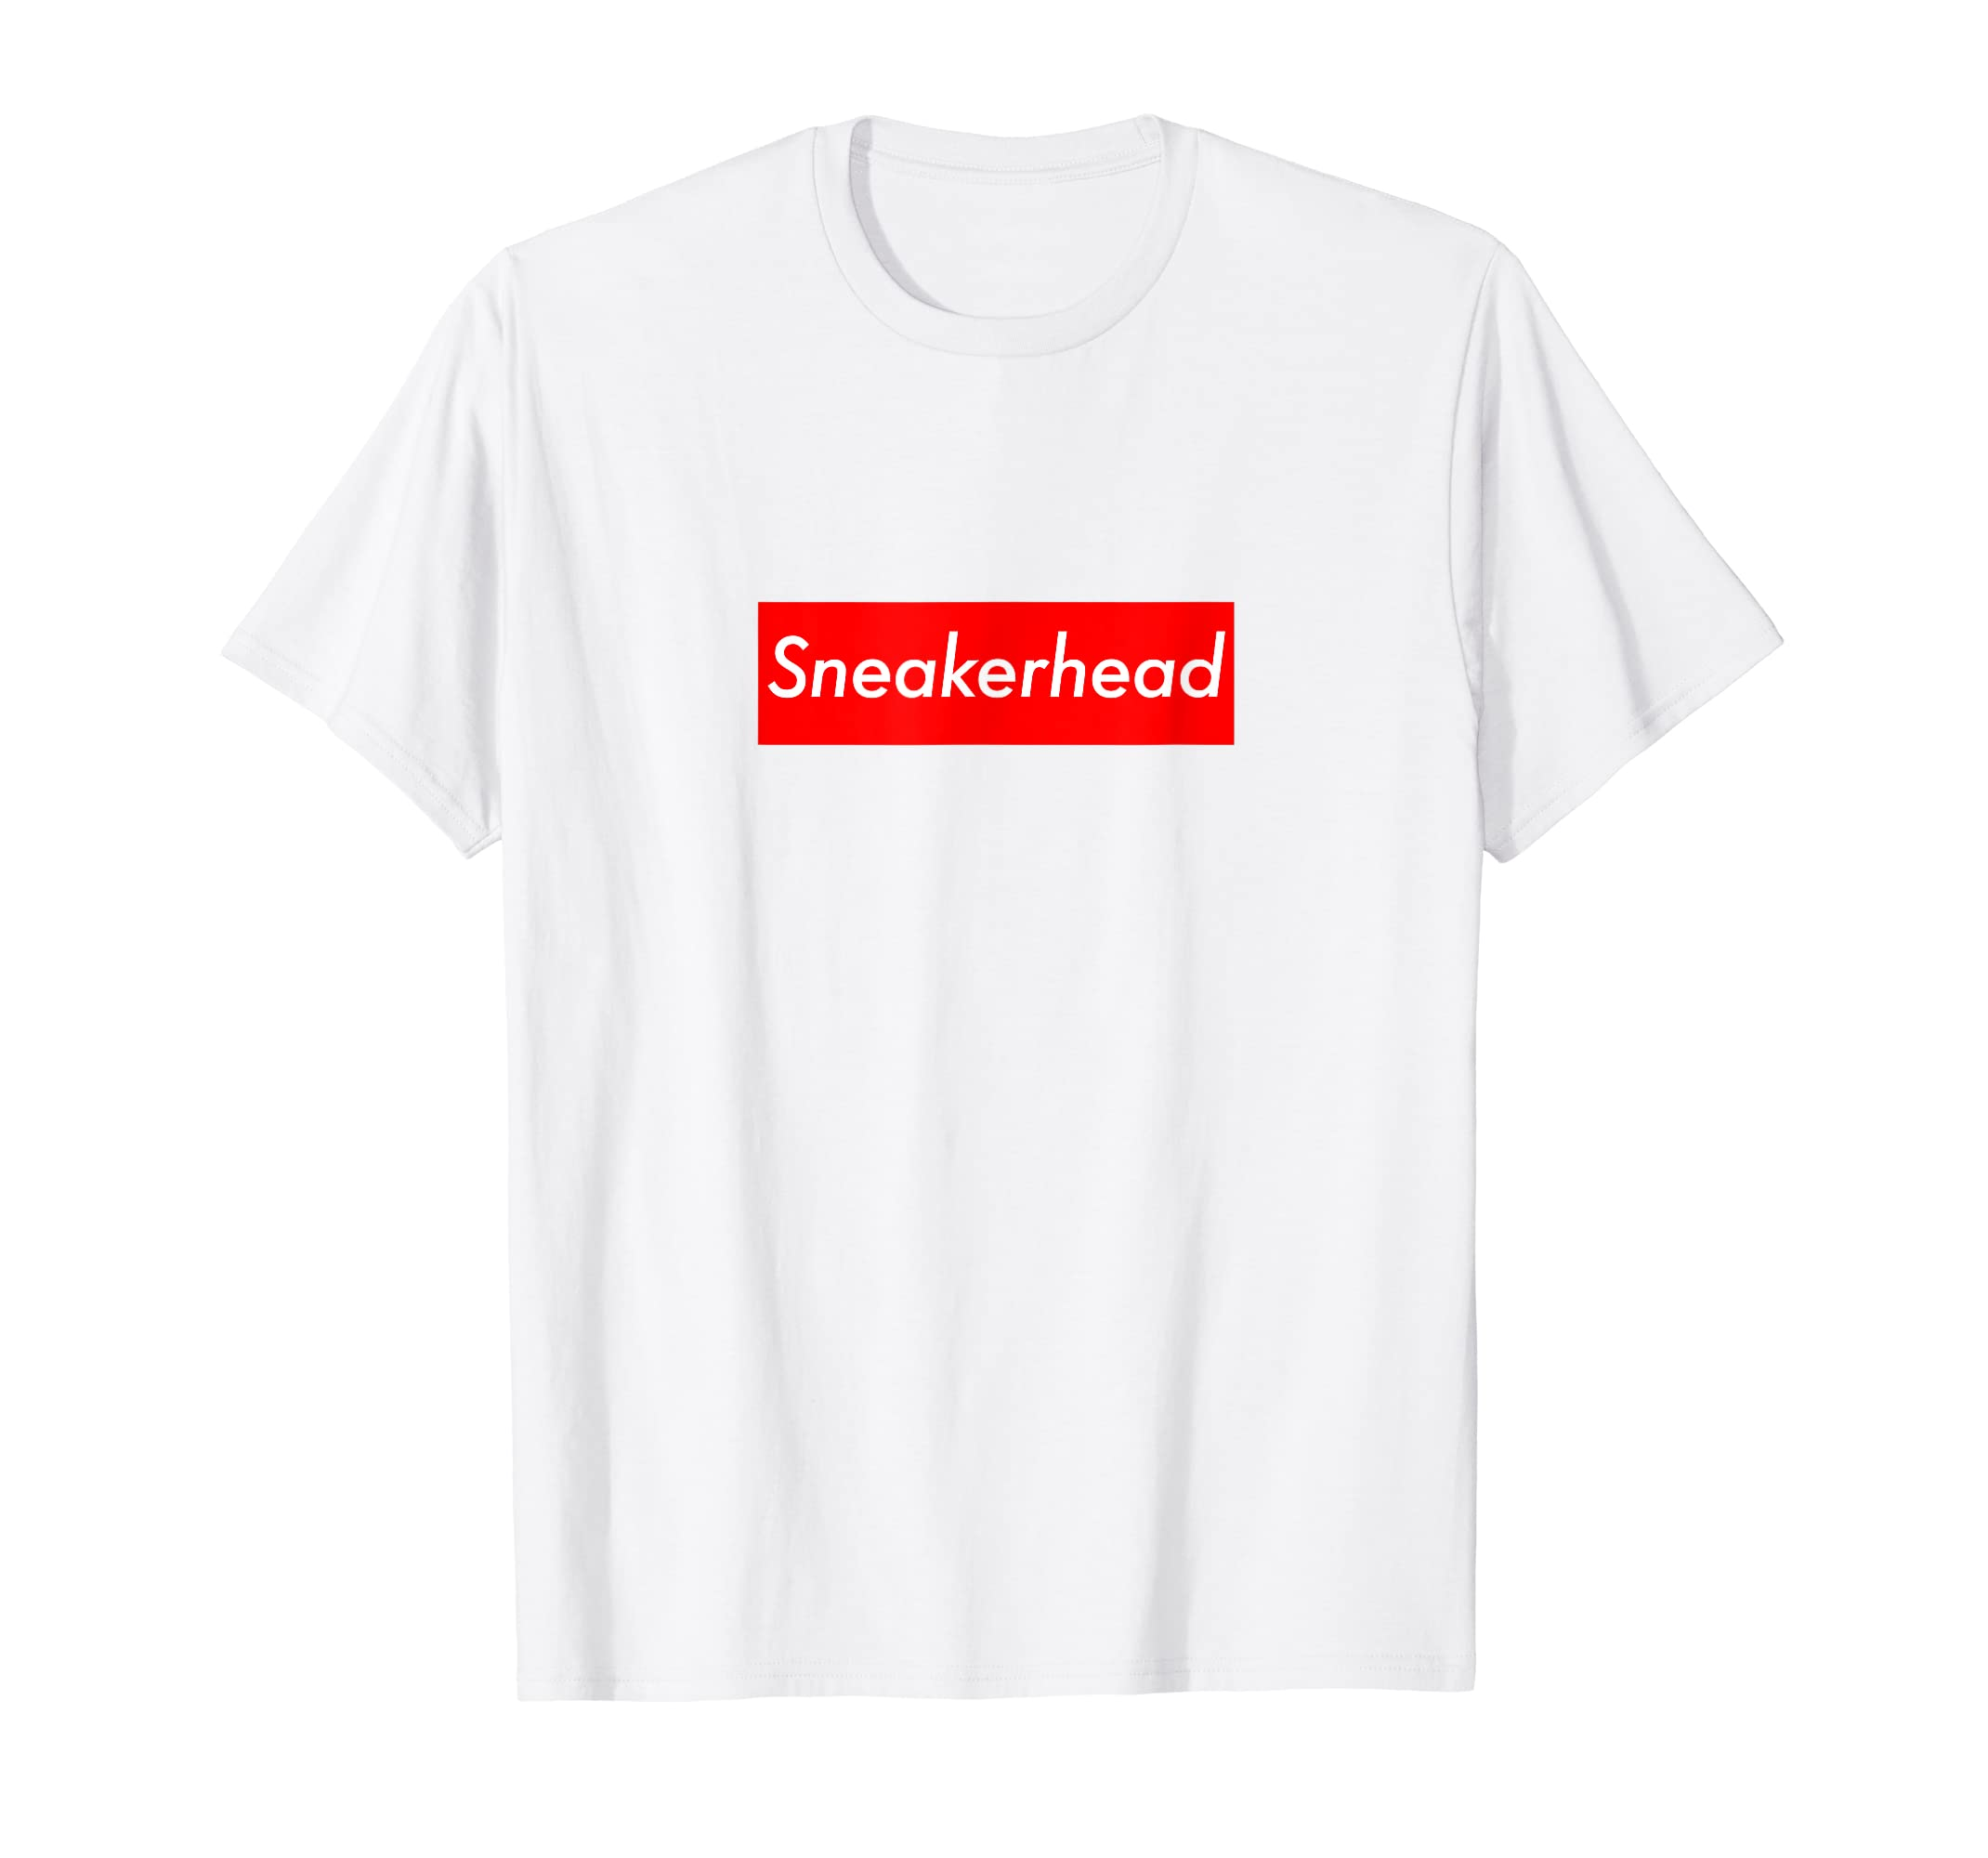 9fb77e8f179 Amazon.com: Sneakerhead T-Shirt   Classic Box Logo Sneakerhead Tee: Clothing